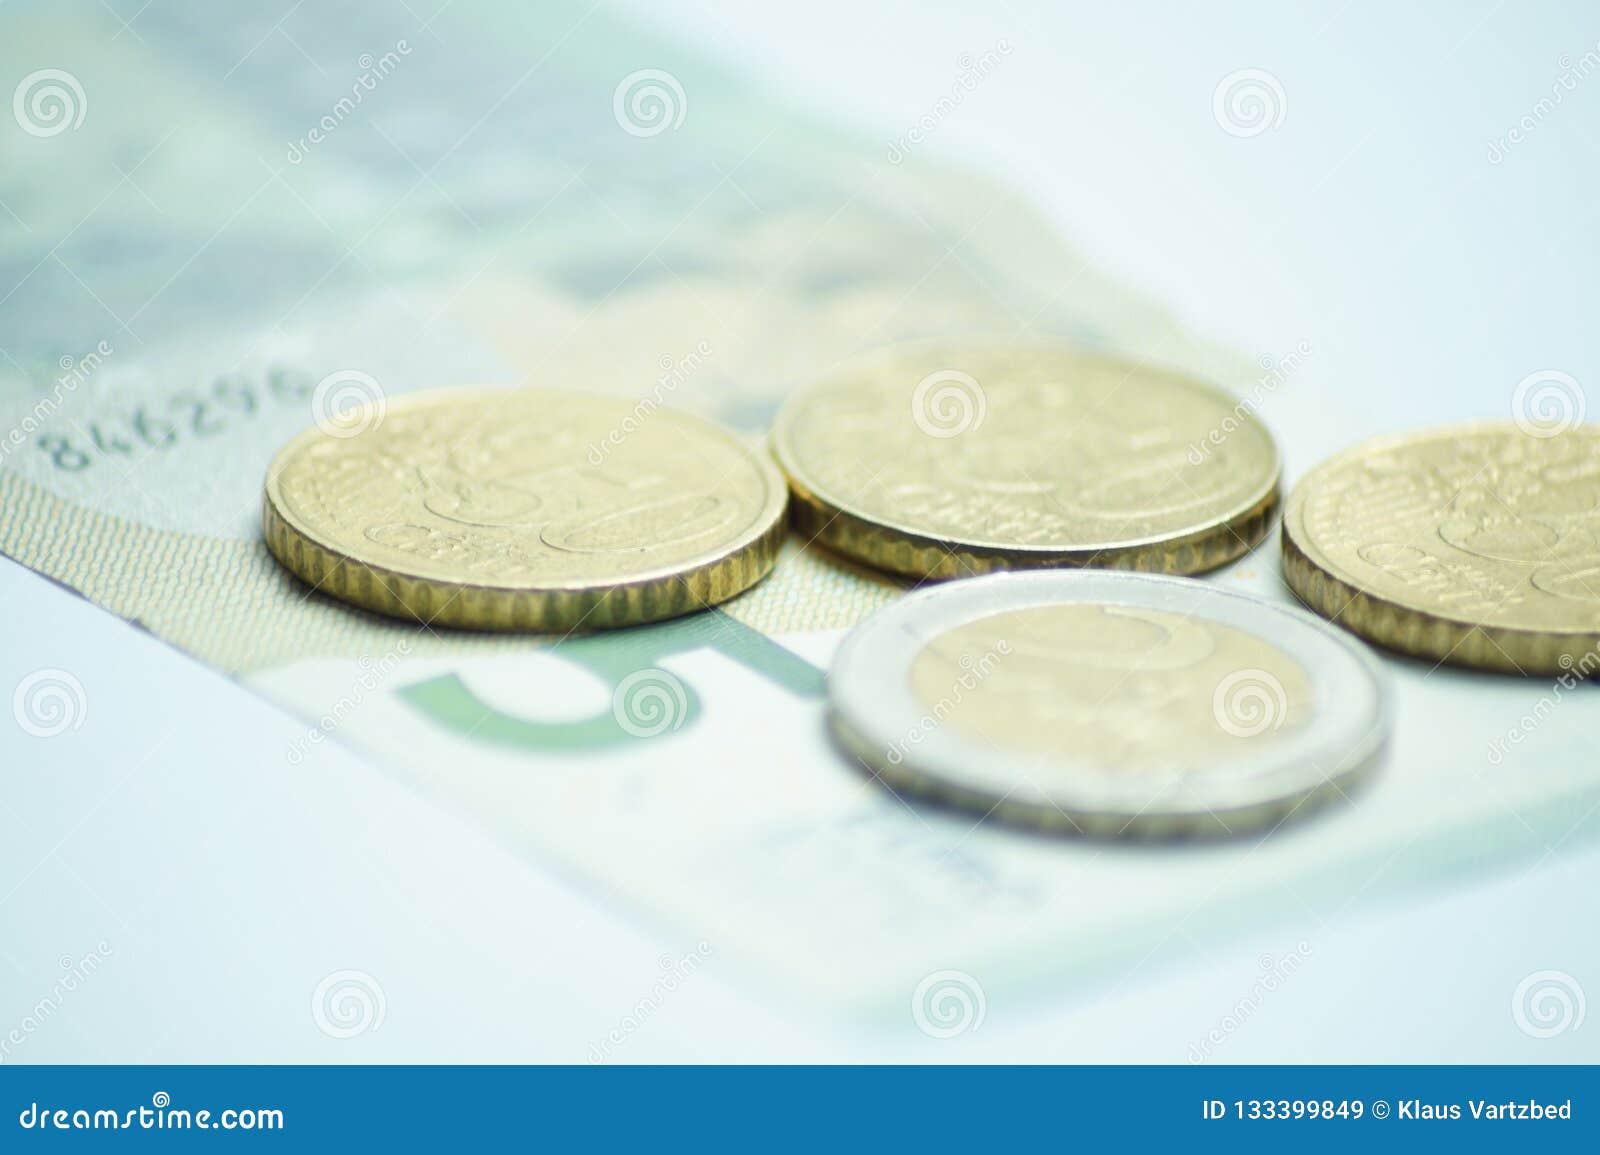 Евро 8,50 с монетками евро и банкнотой